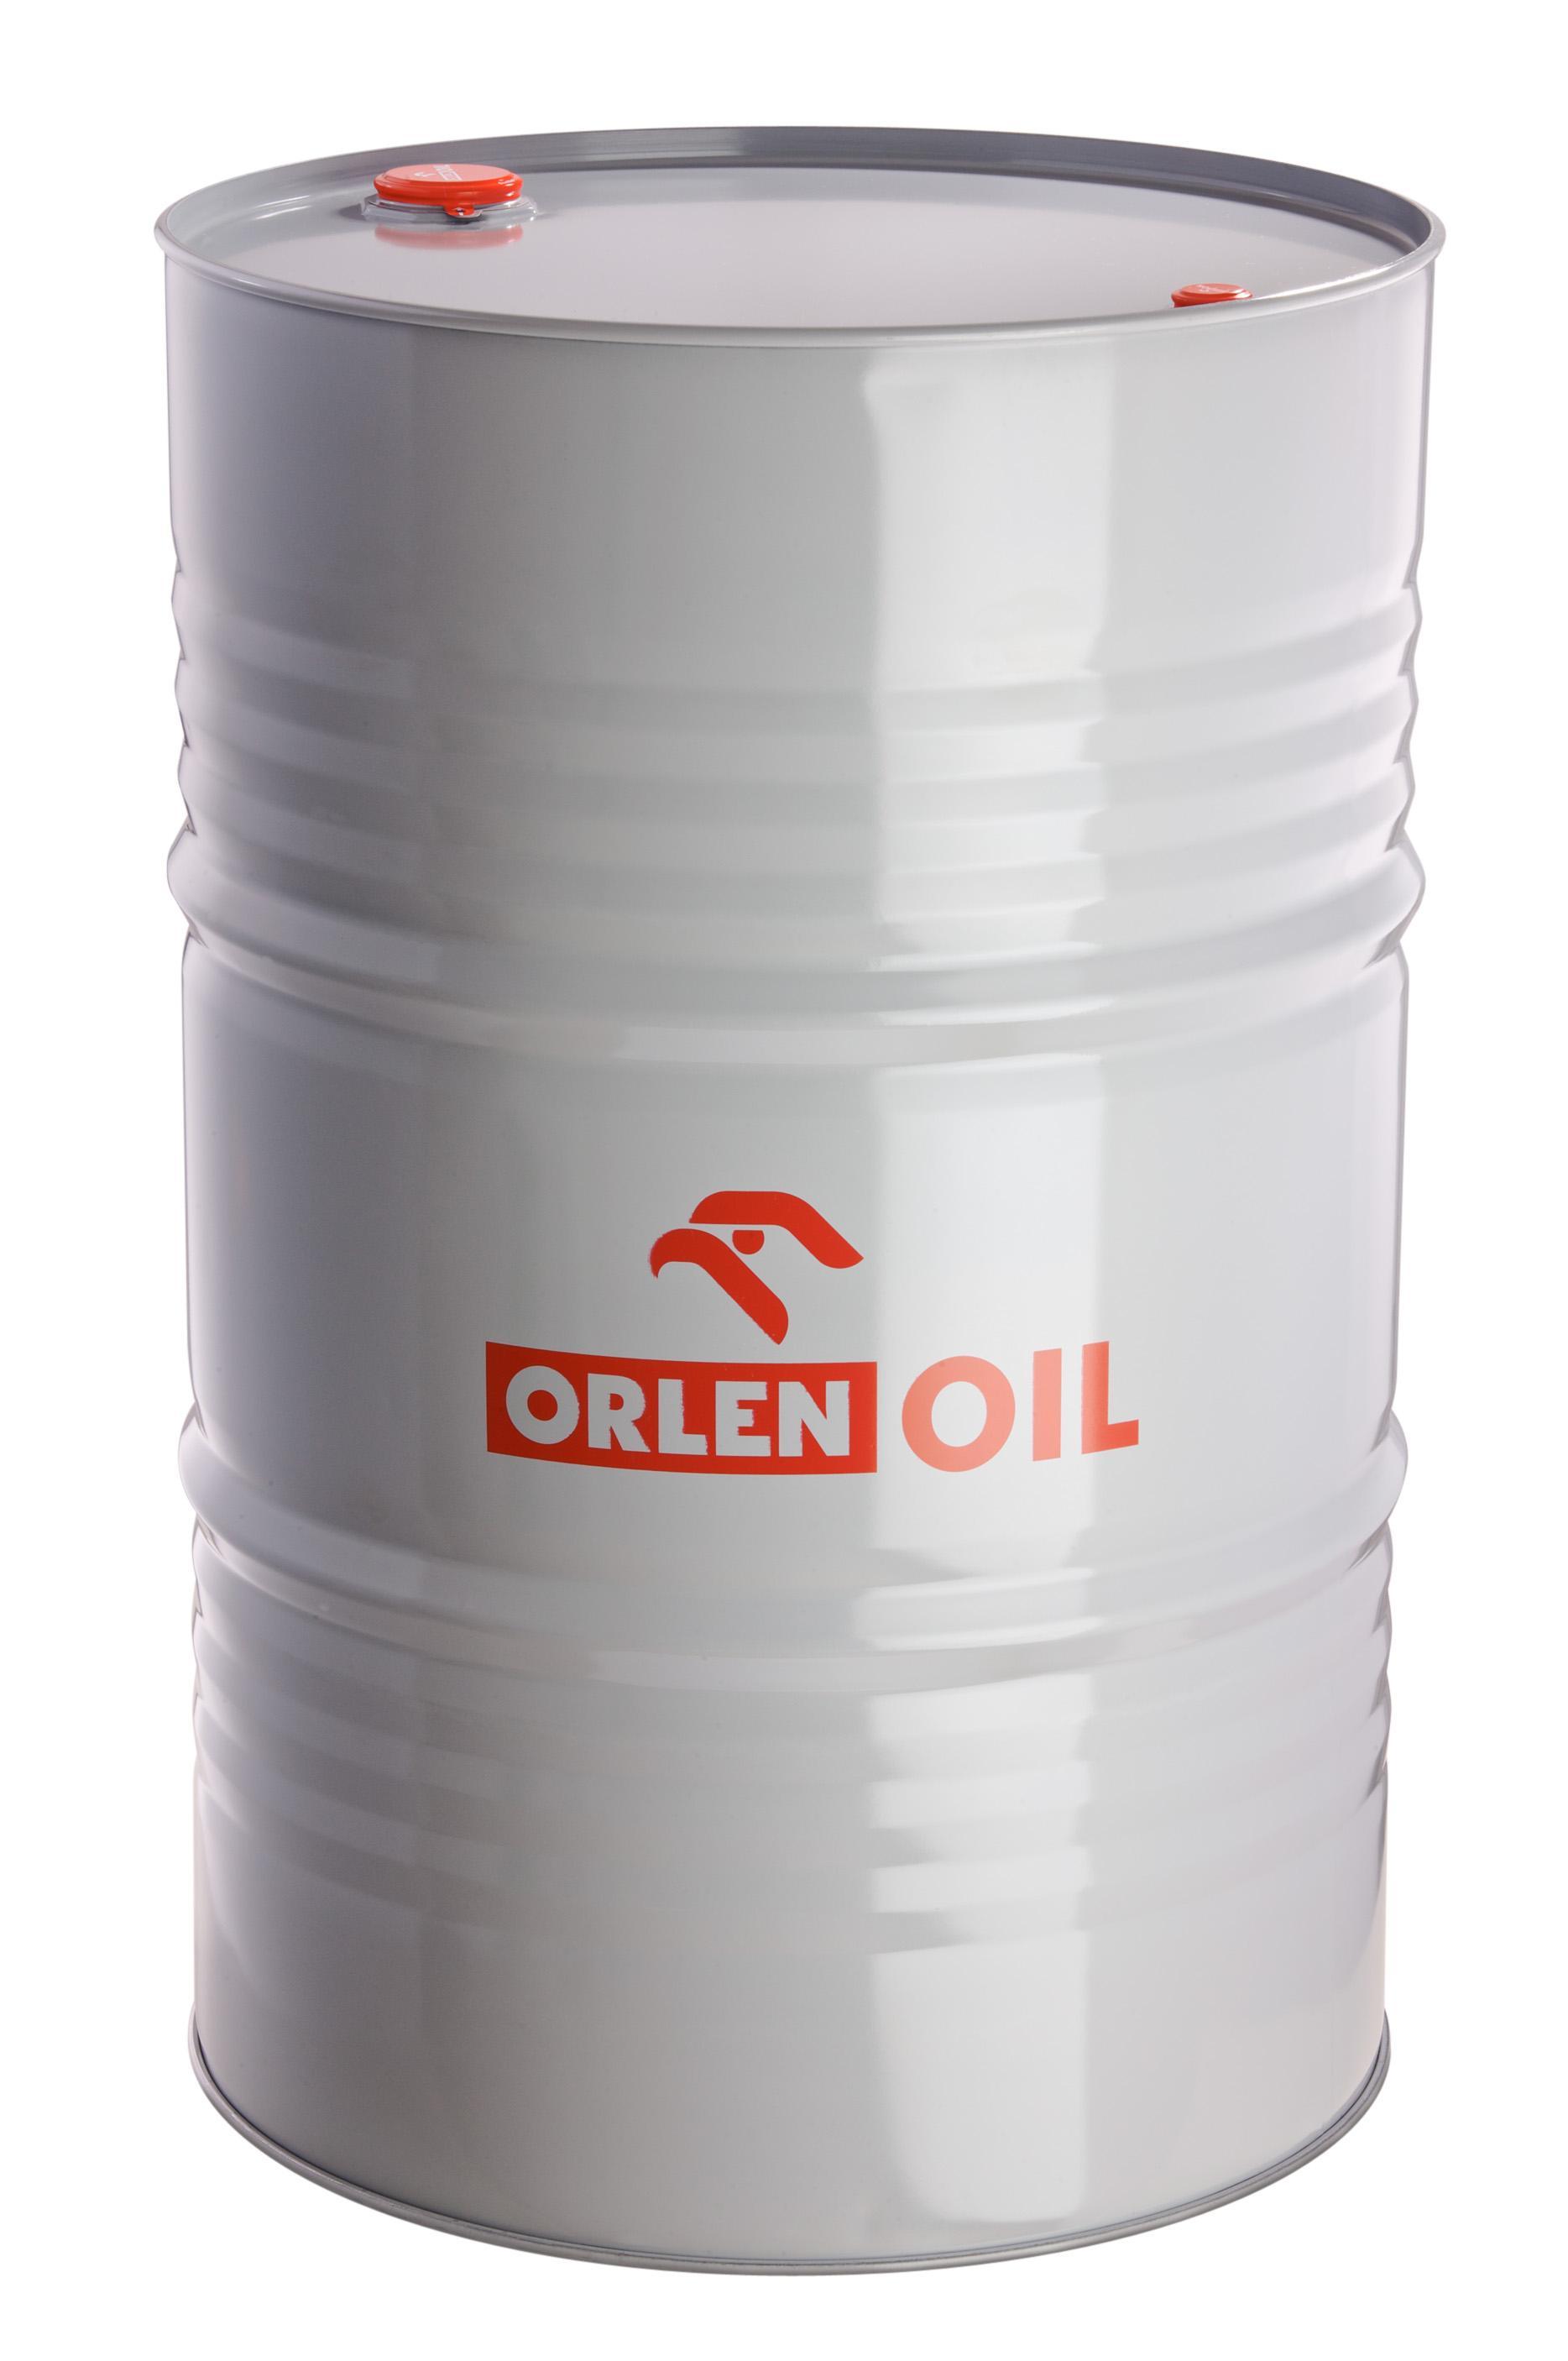 ORLEN OIL OLEJ ELEKTROIZOLACYJNY TRAFO EN  BECZKA 205L *